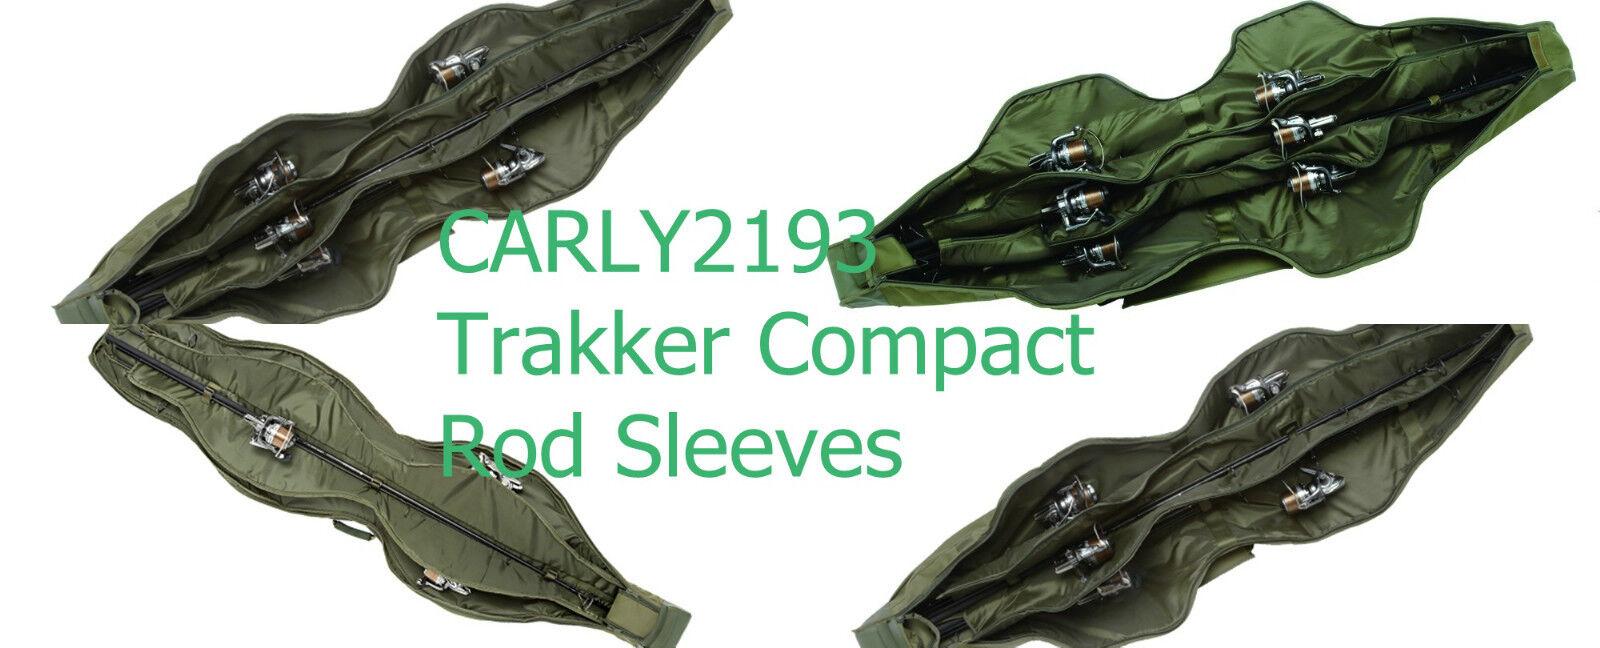 Trakker Compact Rod Sleeve Full Range - Carp Fishing Rod Sleeves